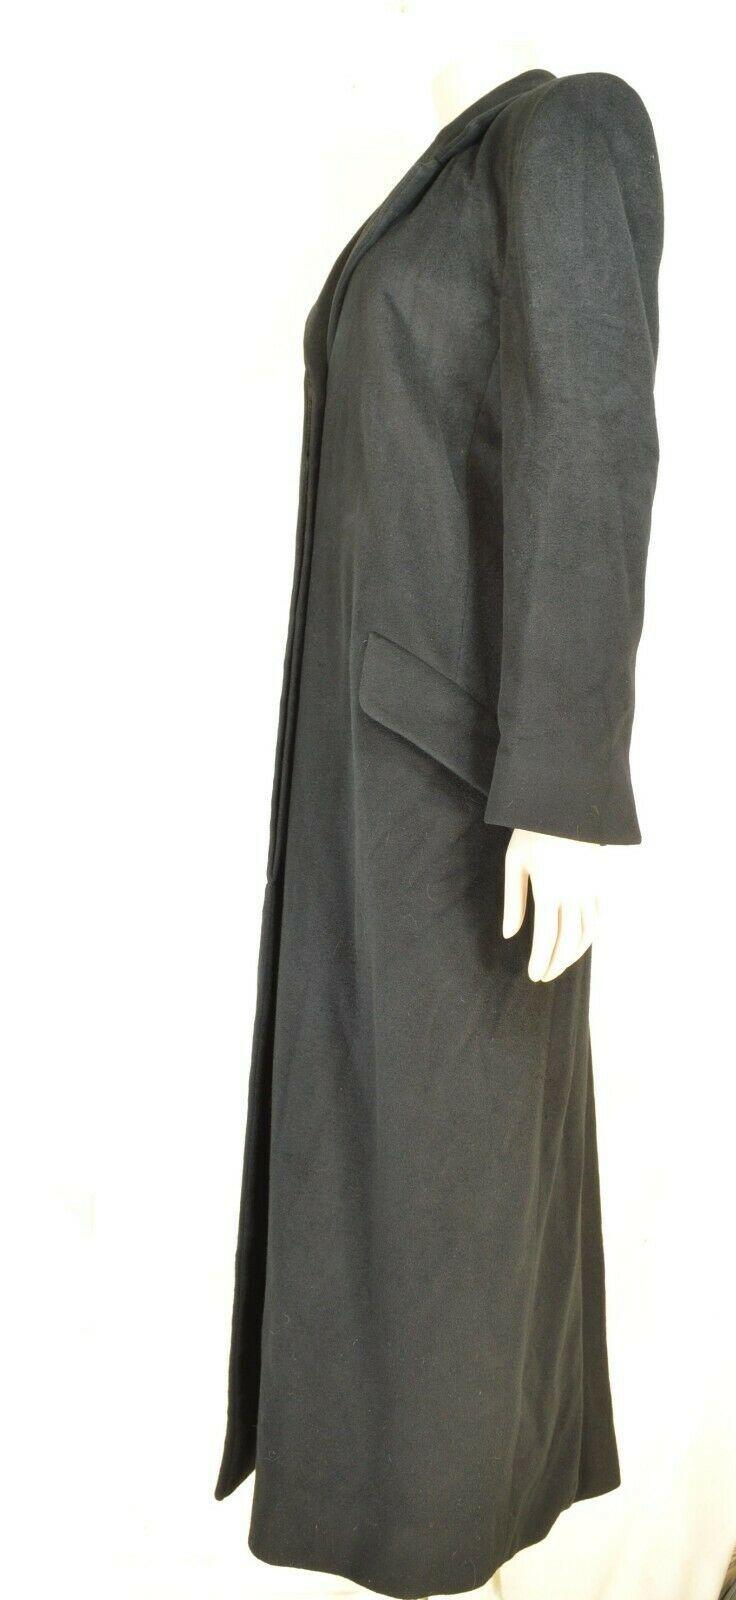 Christian Dior coat SZ 4 black full length straight 100% cashmere vintage US